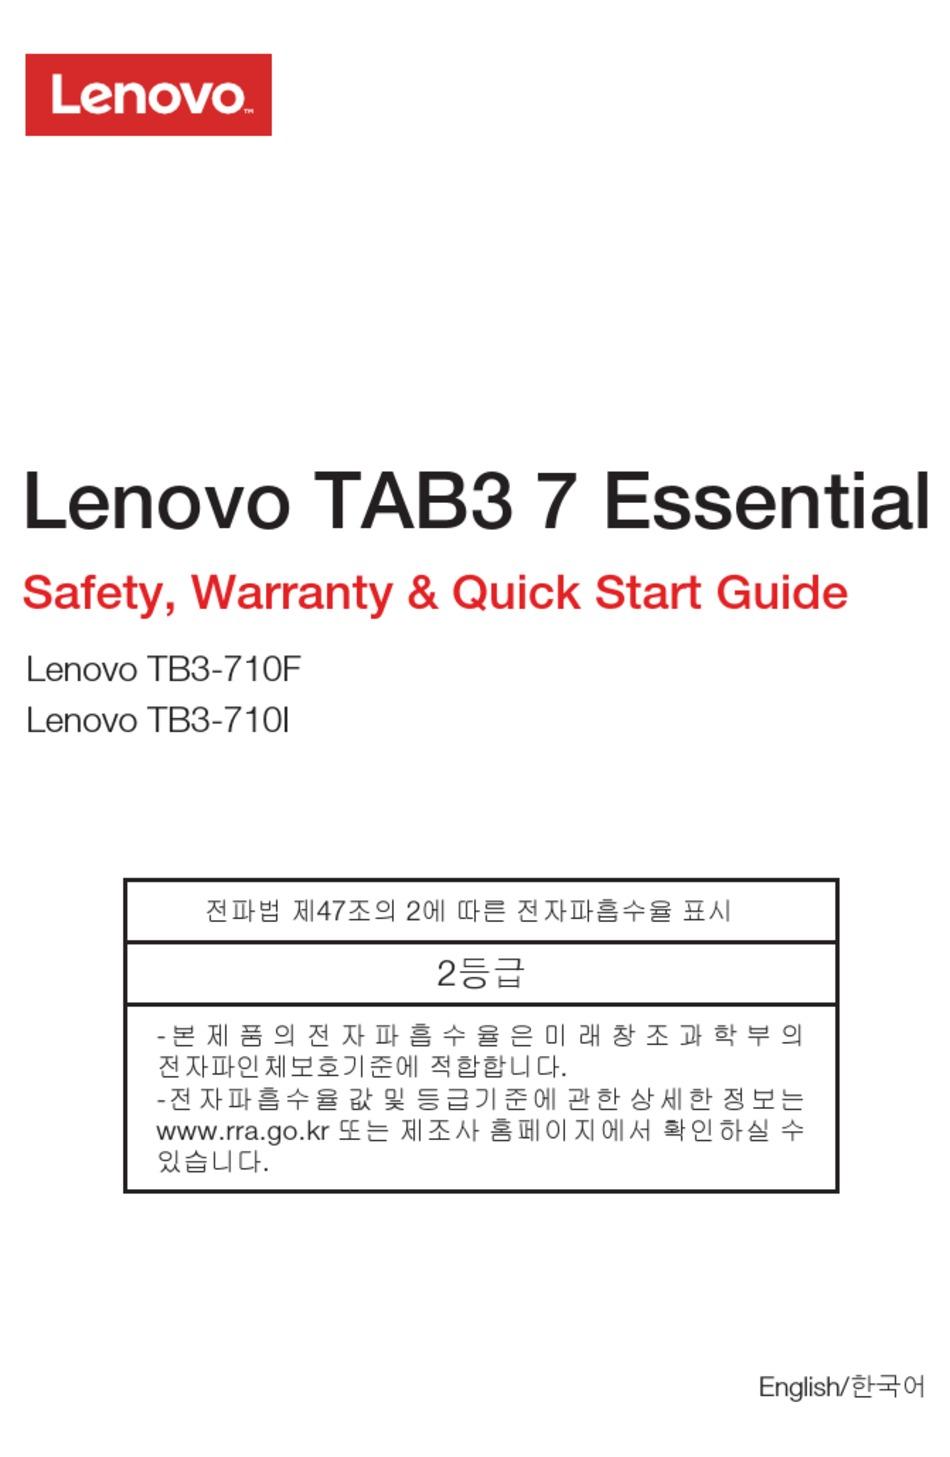 LENOVO TAB3 7 ESSENTIAL SAFETY, WARRANTY & QUICK START